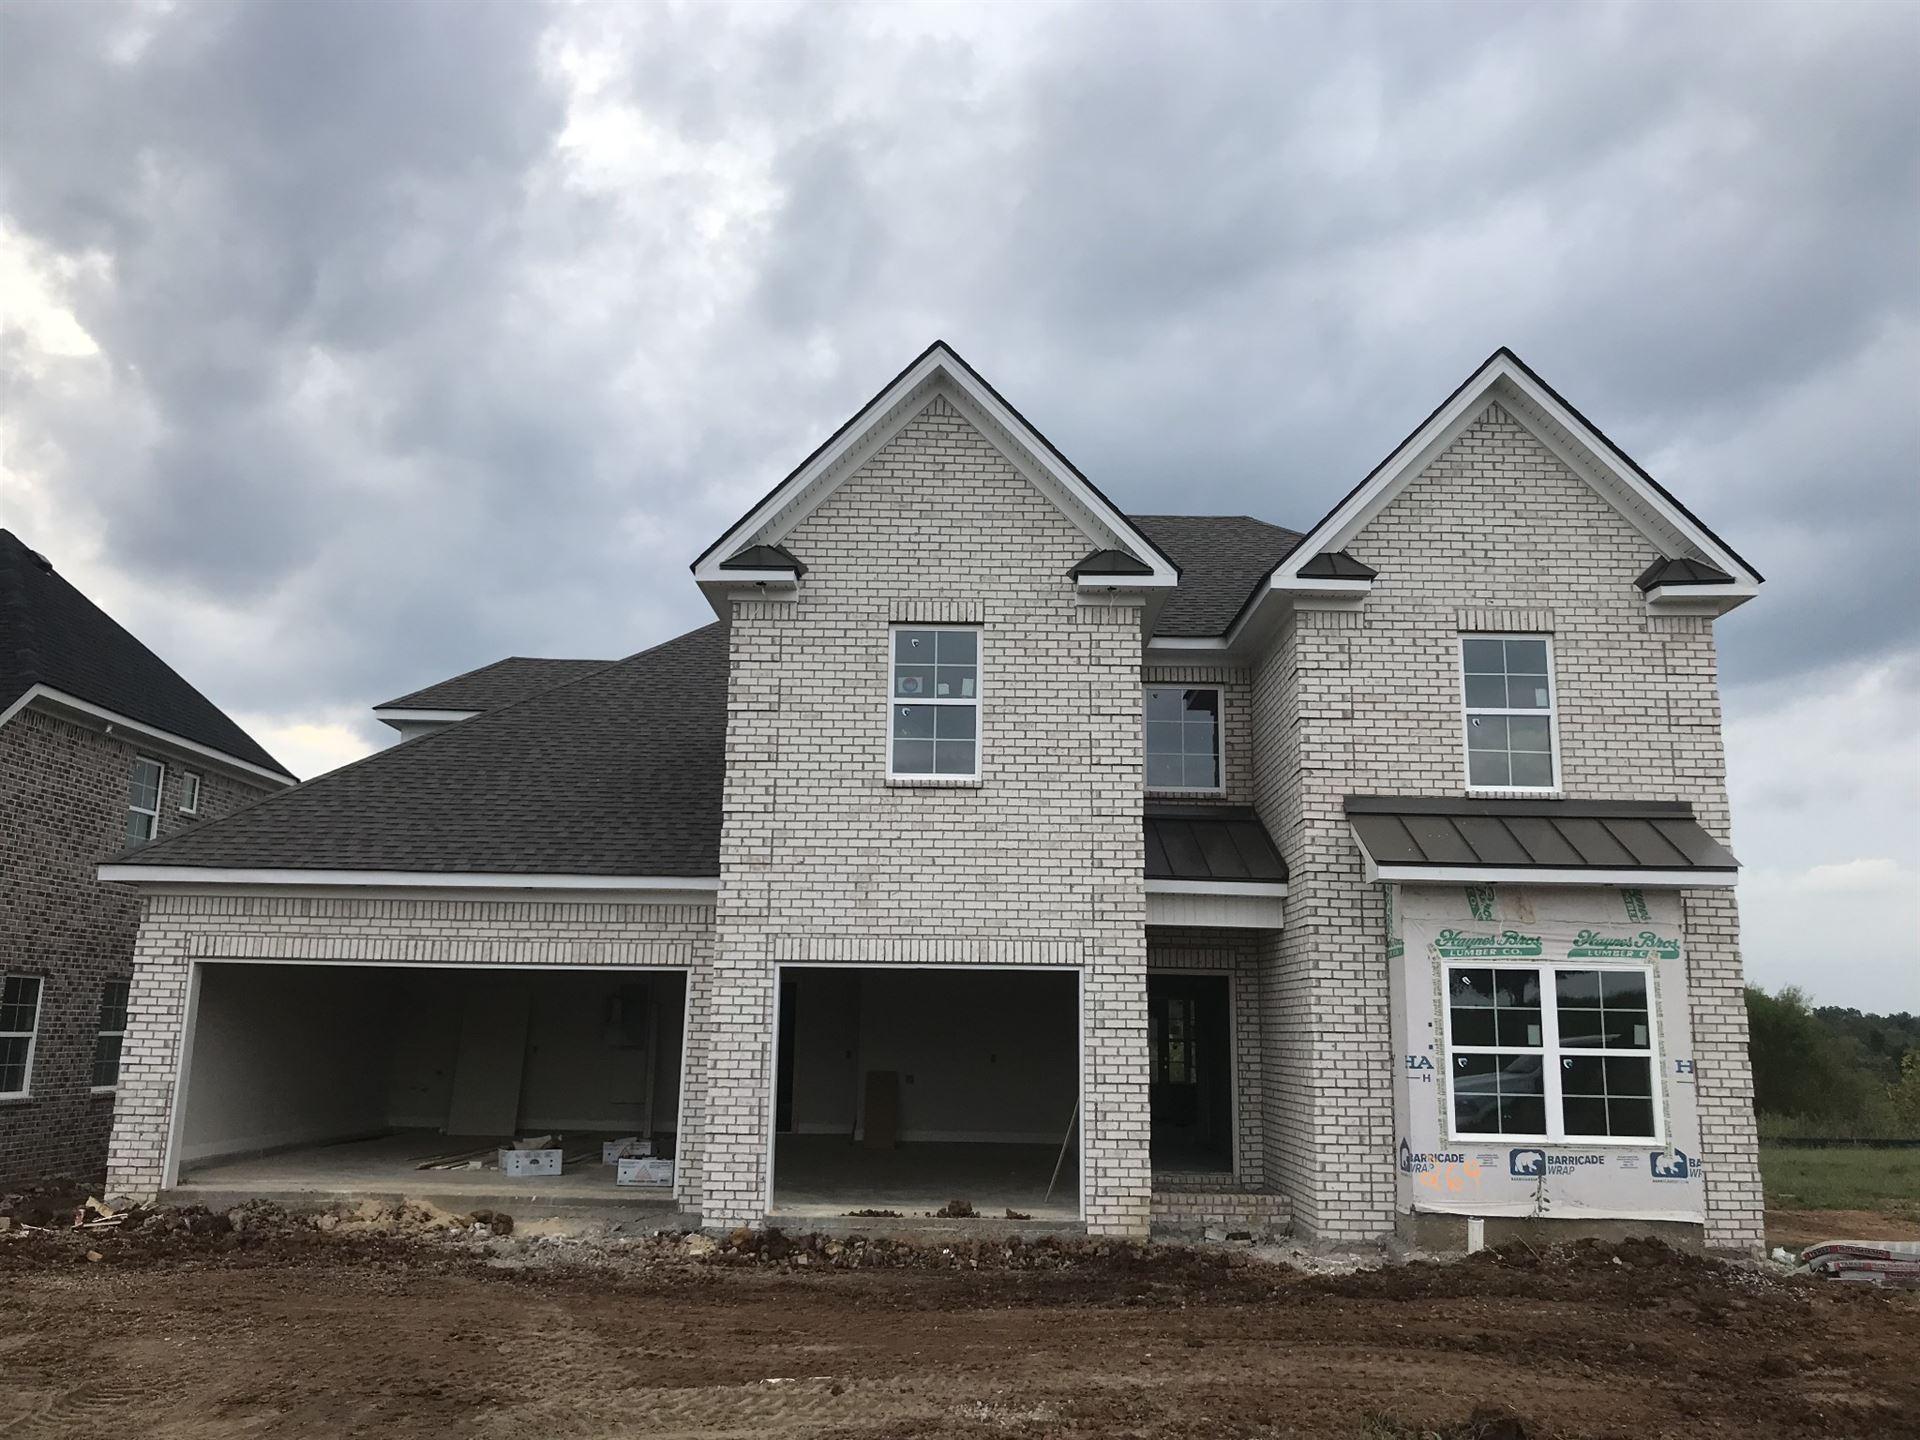 2216 Winterdale Lot 269, Murfreesboro, TN 37128 - MLS#: 2291005